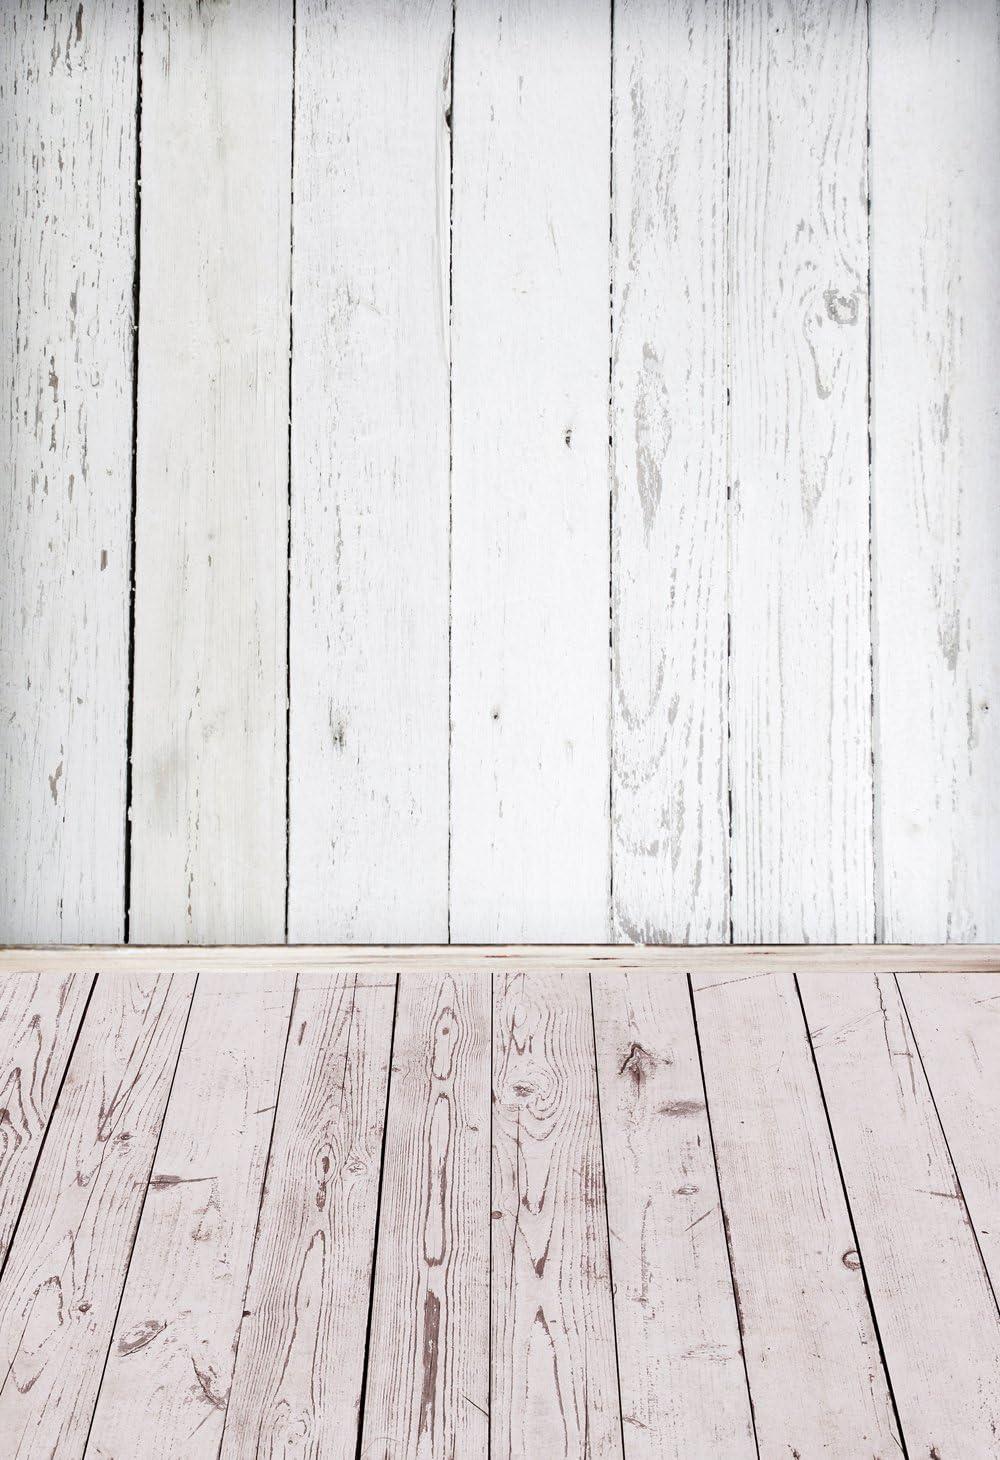 hua-uk blanco madera fotografía fondo para niños fiesta de cumpleaños de pastel rosa mascota xt-5109